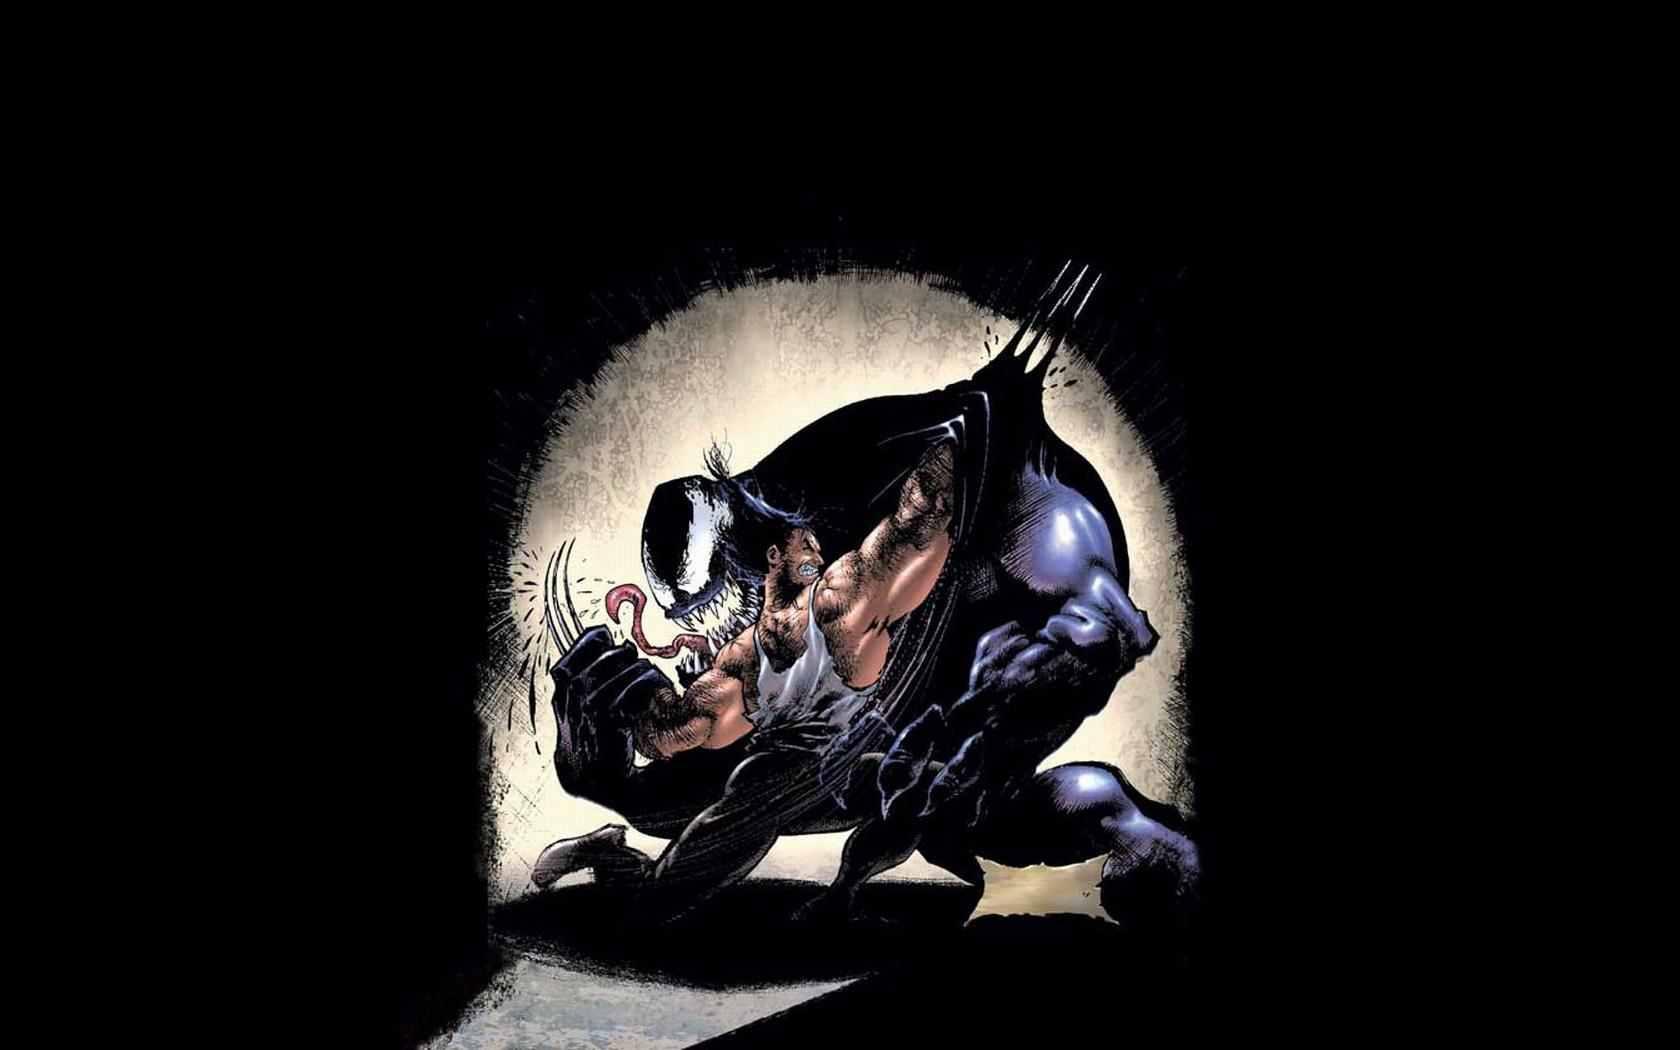 Venom Wolverine Wallpaper 1680x1050 Venom Wolverine Marvel Comics 1680x1050